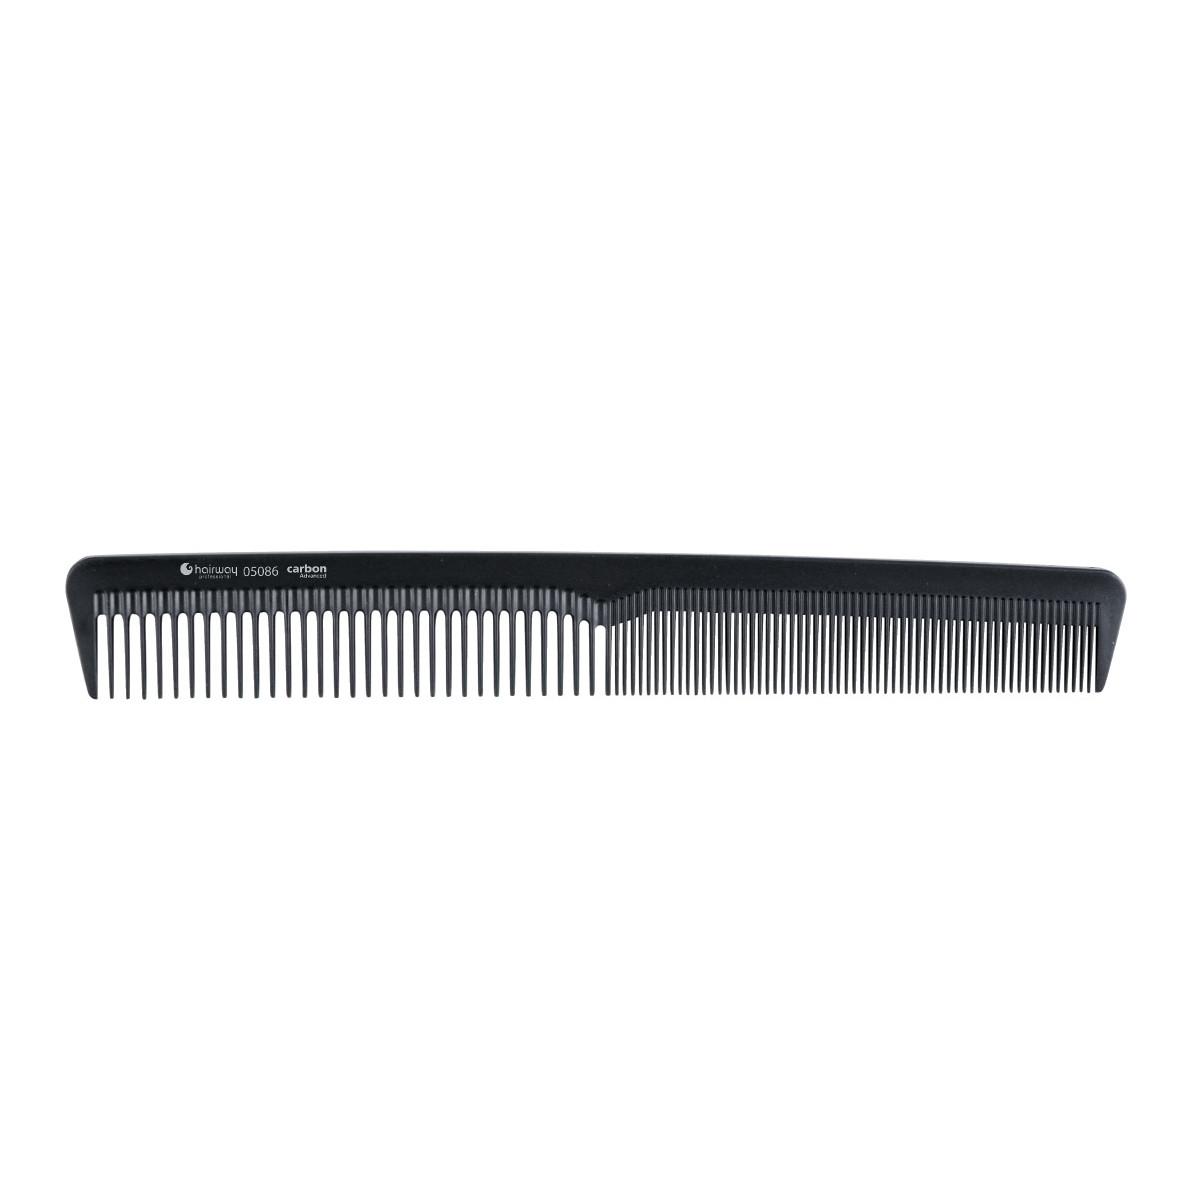 Гребень Hairway 05086 карбоновый гипоаллергенный 180 мм